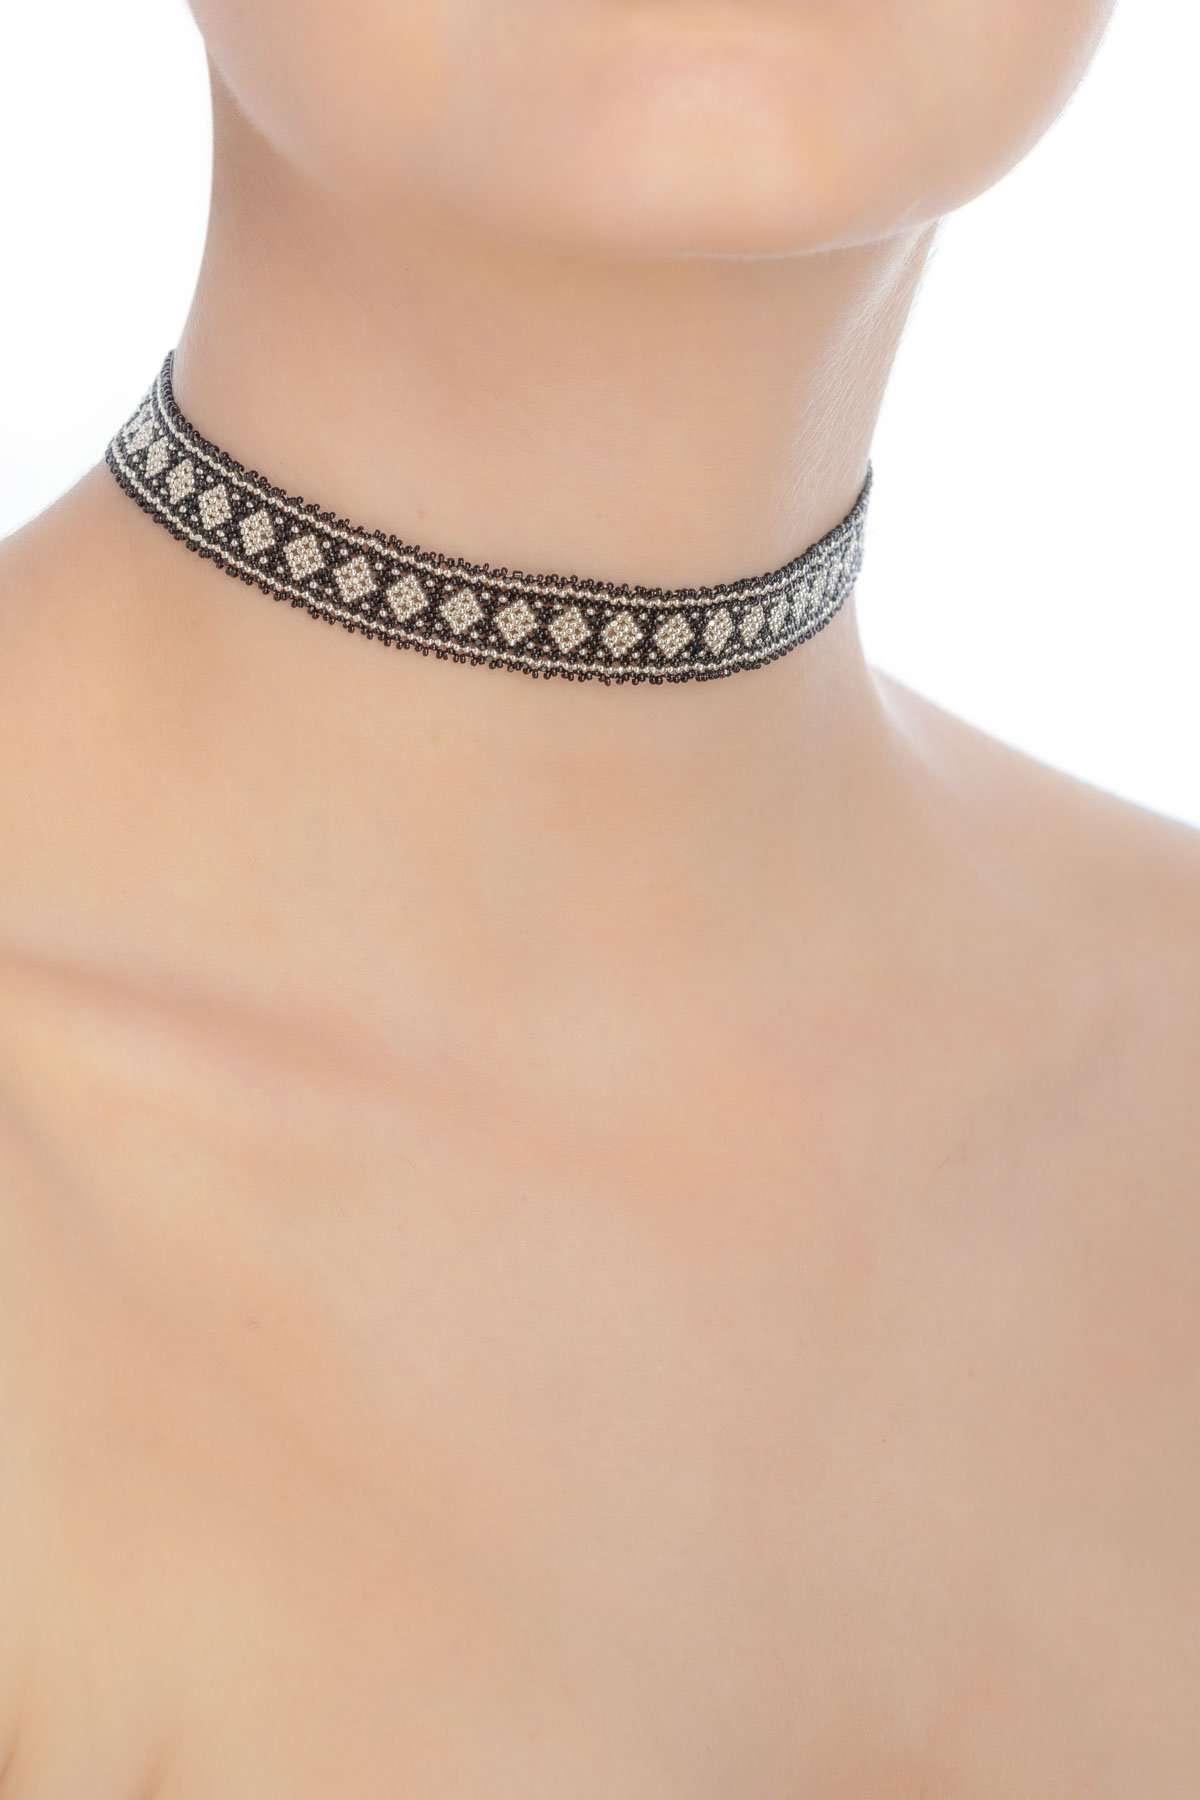 001-gargantilla-kuu-hiwari-plata-cristal-negro-alt1